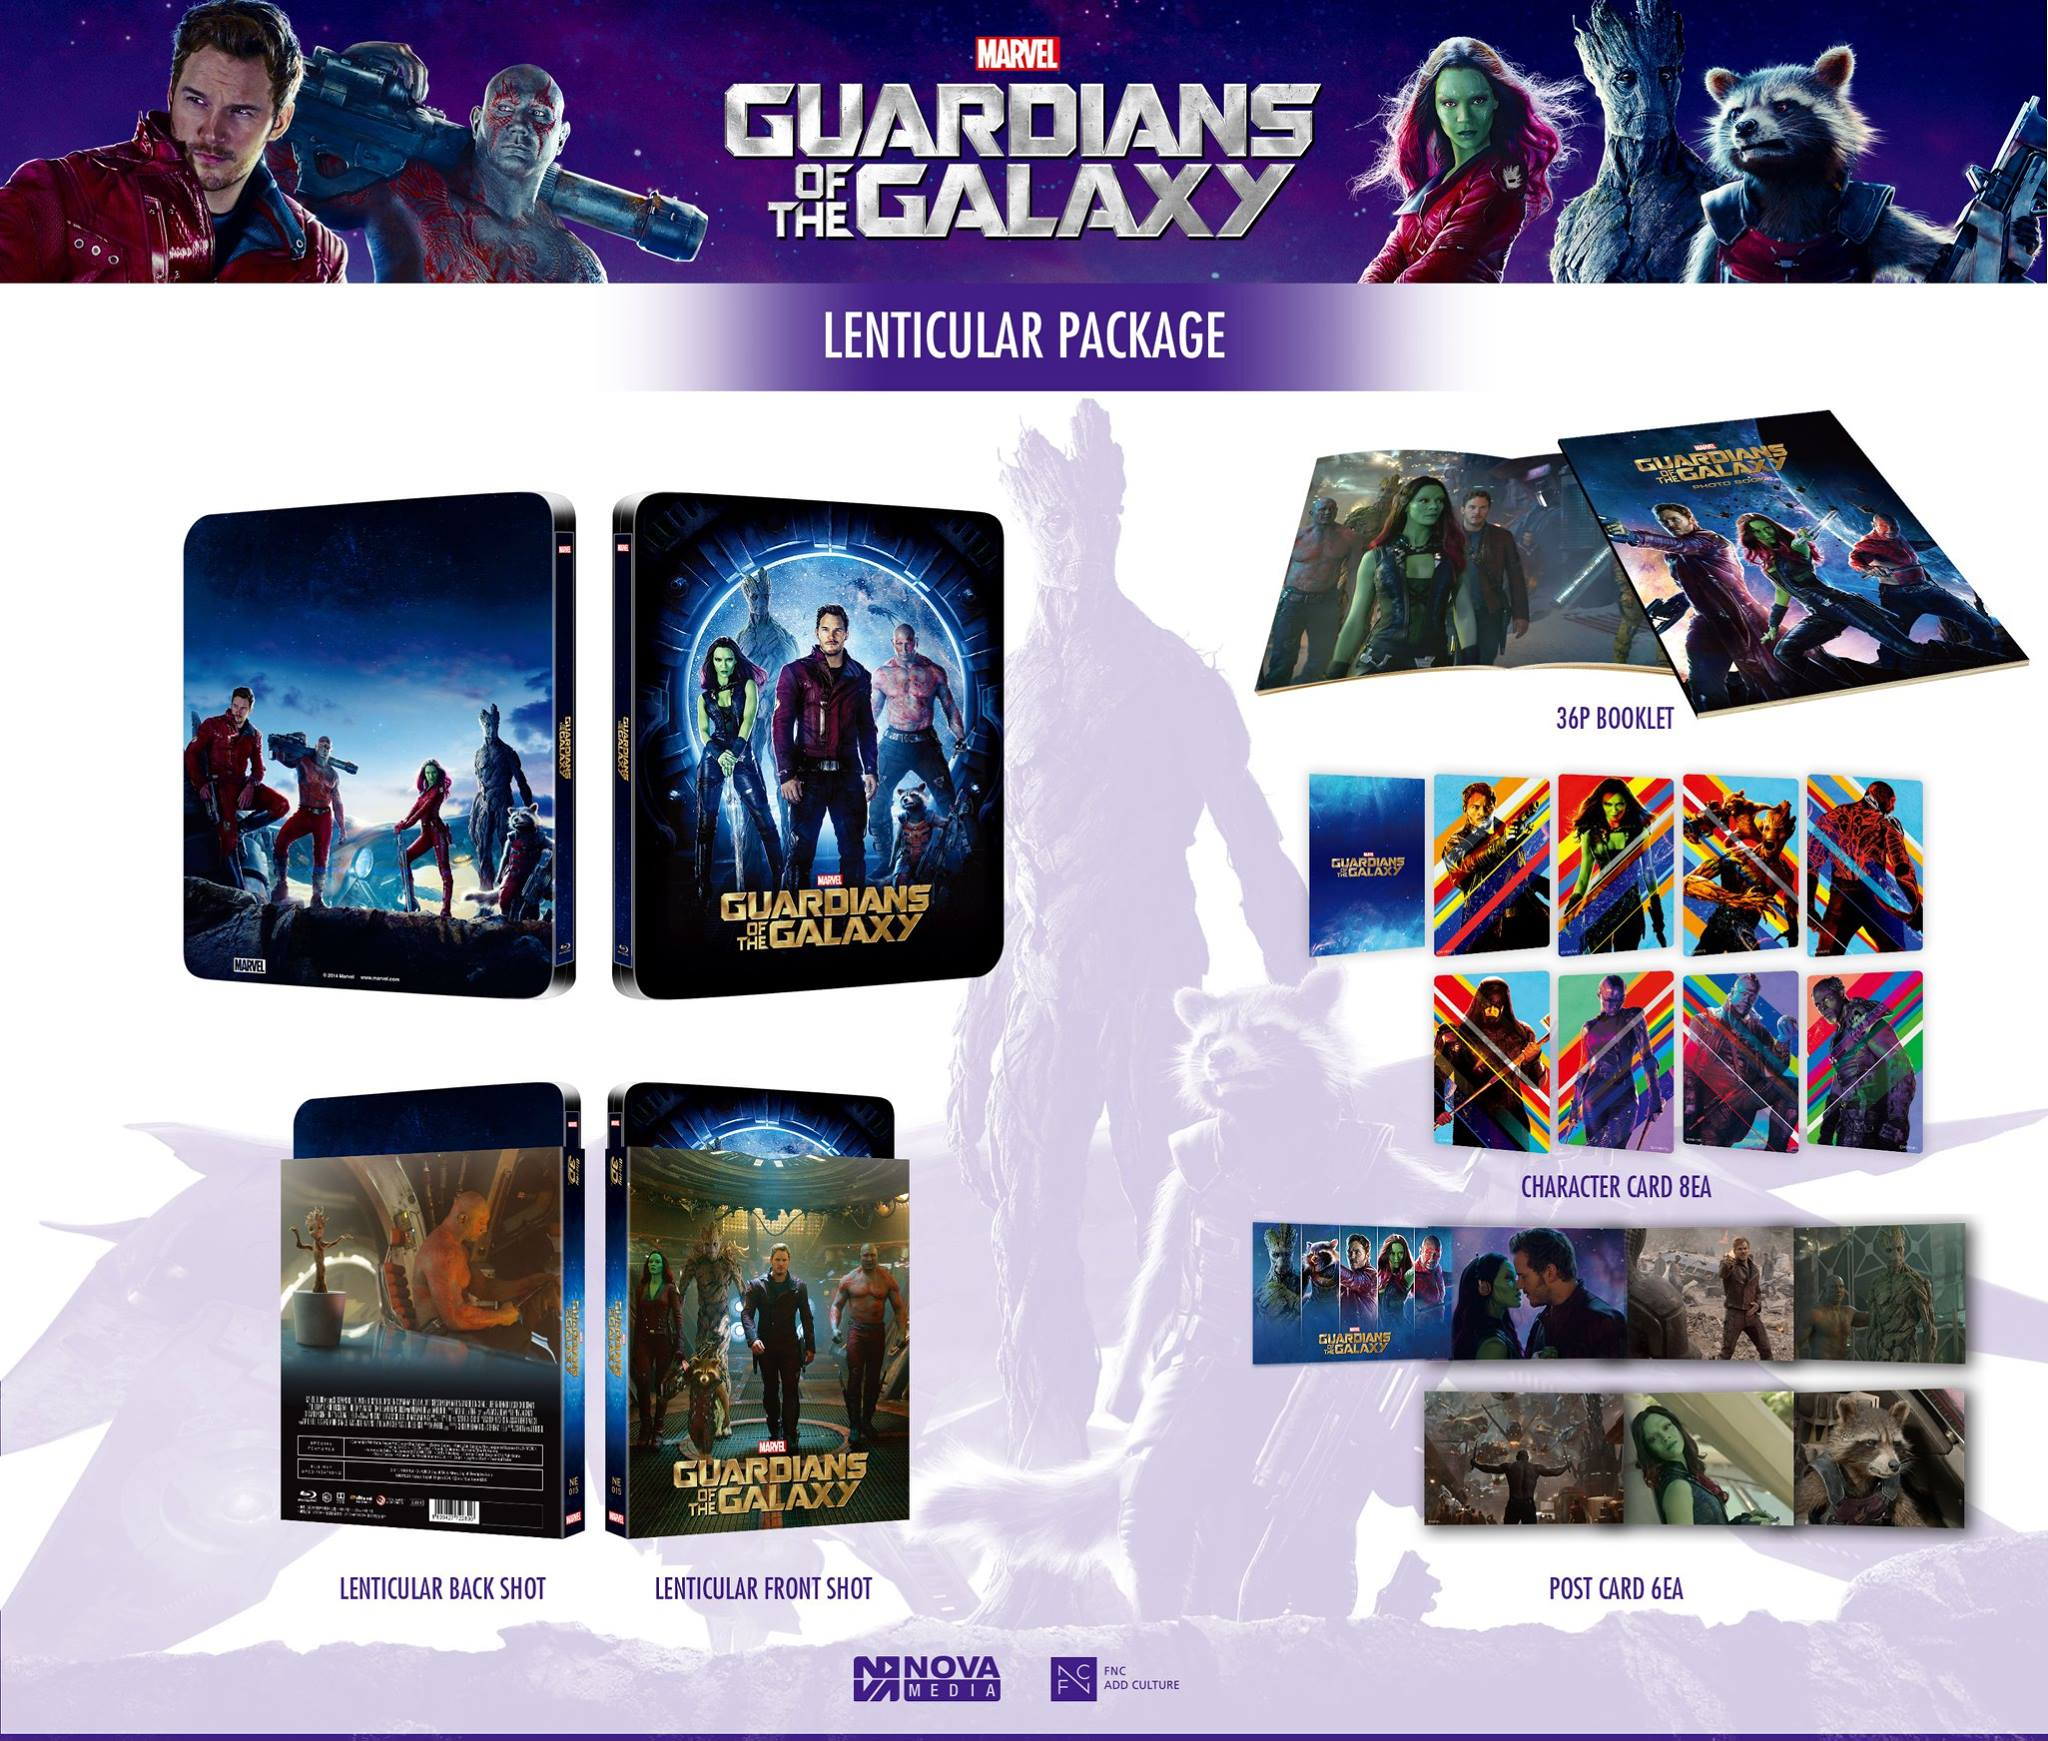 Guardians-of-the-Galaxy-novamedia steelbook 3